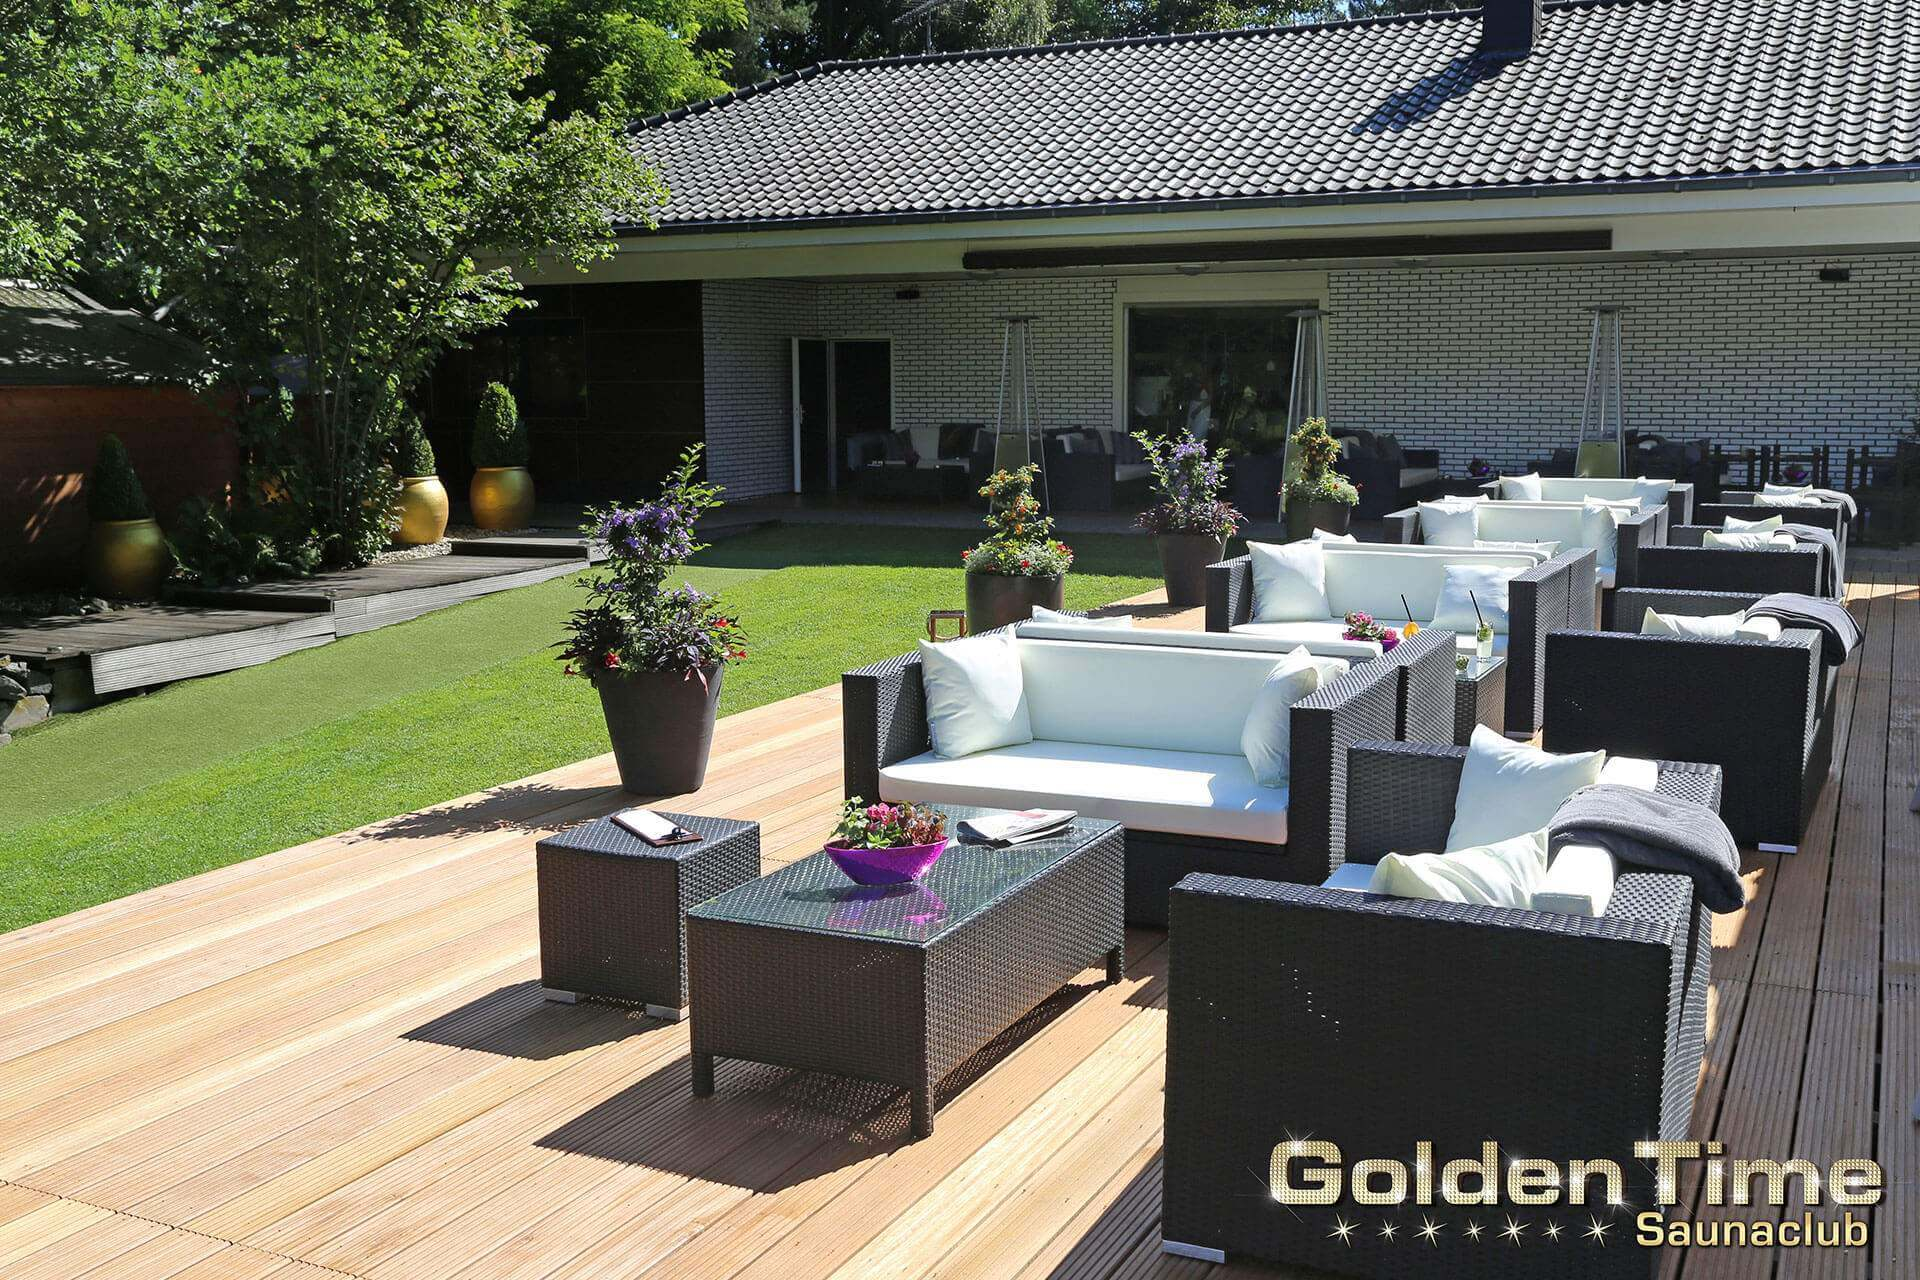 01-terrasse-pic-10-goldentime-saunaclub.jpg